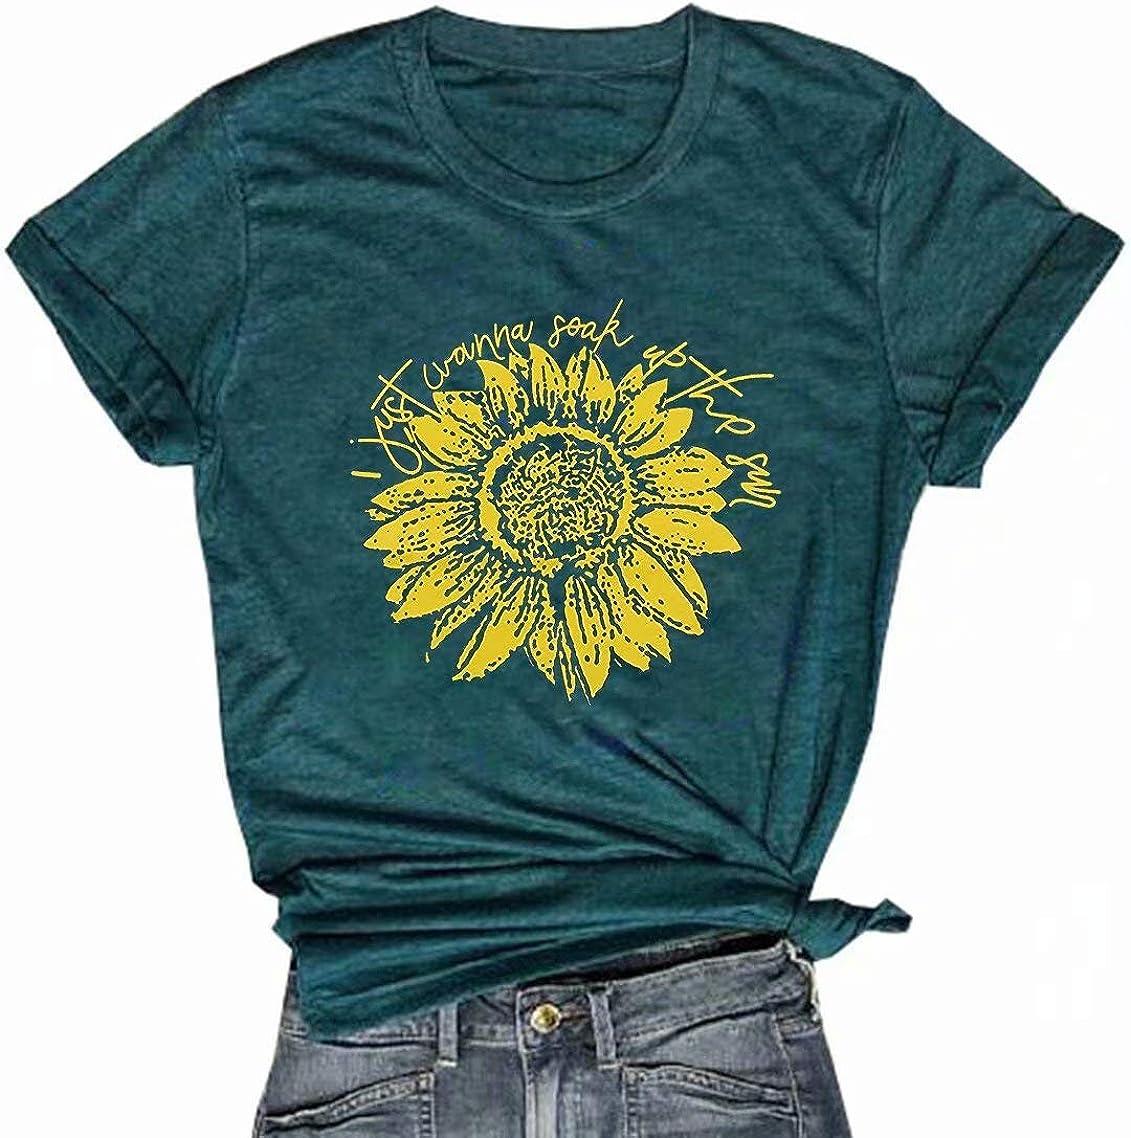 NANYUA I Just Wanna Soak Up The Sun T Shirt Women Funny Sunflower Vintage Faith Tops Tees Casual Short Sleeve Shirts Tops